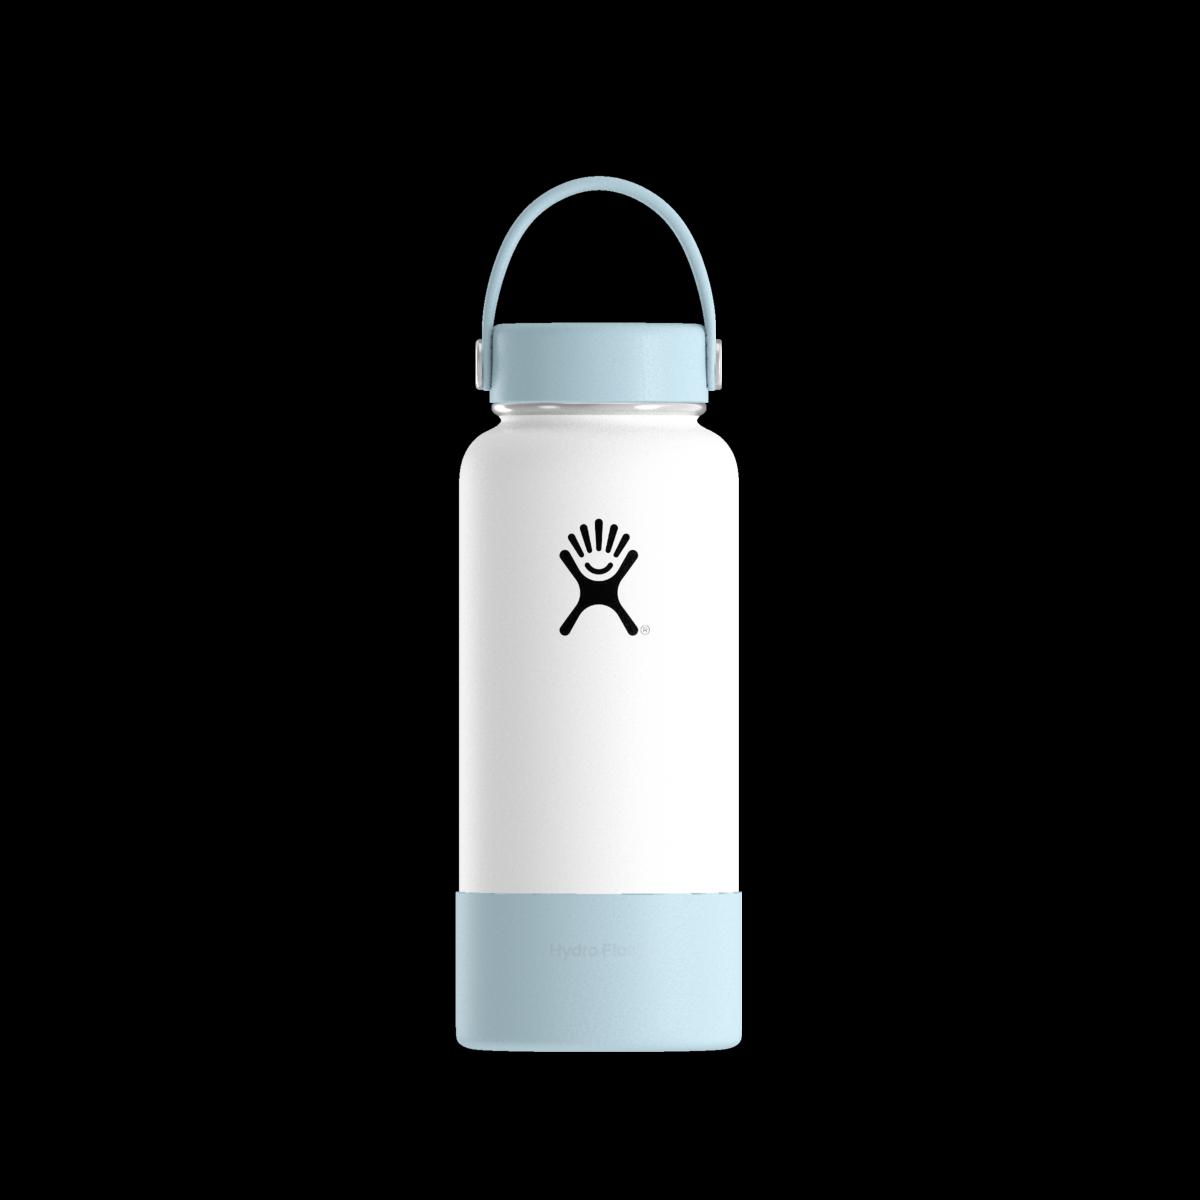 Design Your Custom Wide Mouth Bottle hydroflask Design